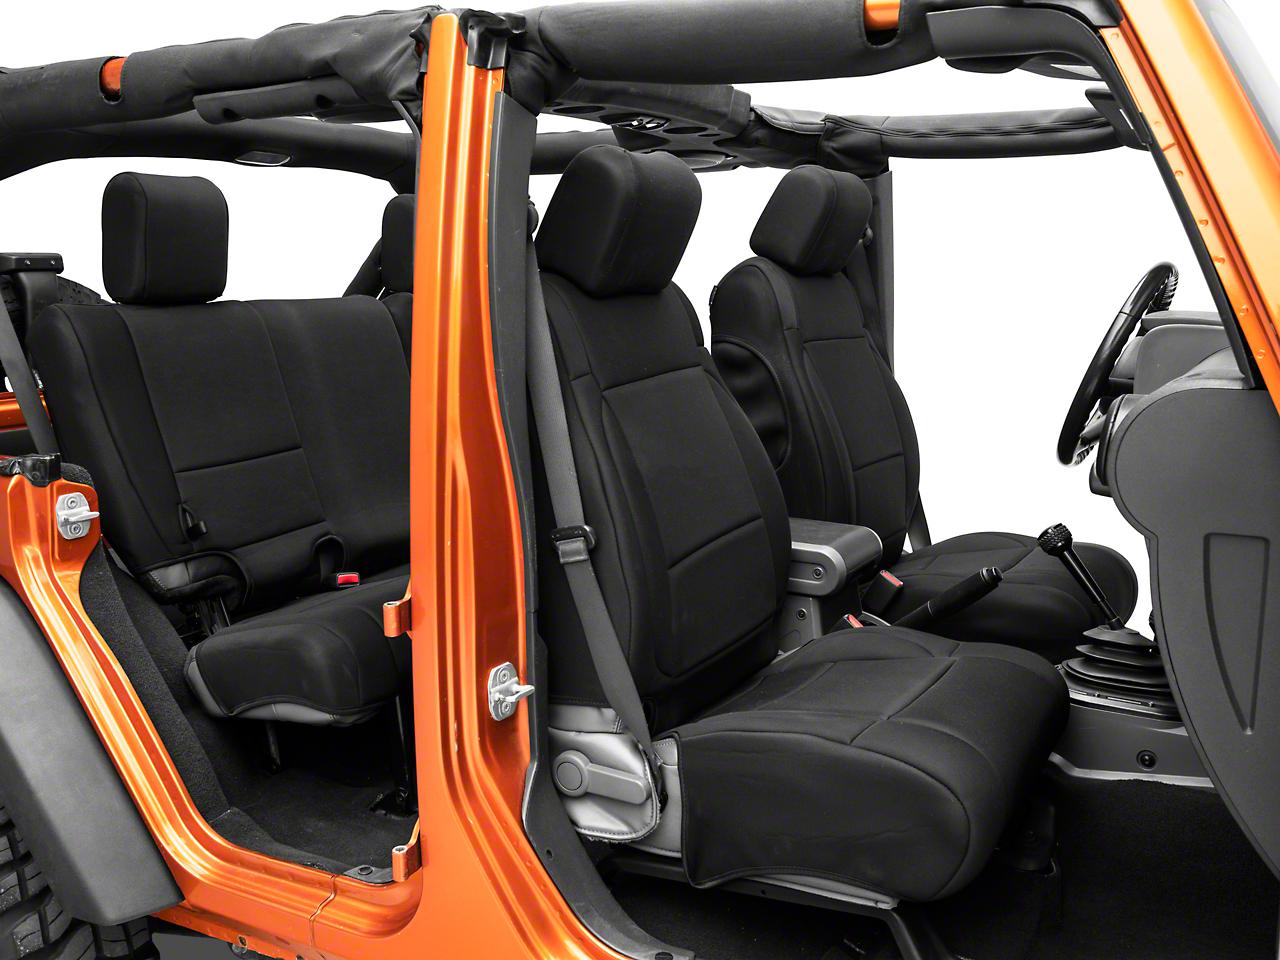 Rugged Ridge Seat Cover Kit - Black (07-18 Jeep Wrangler JK 4 Door)